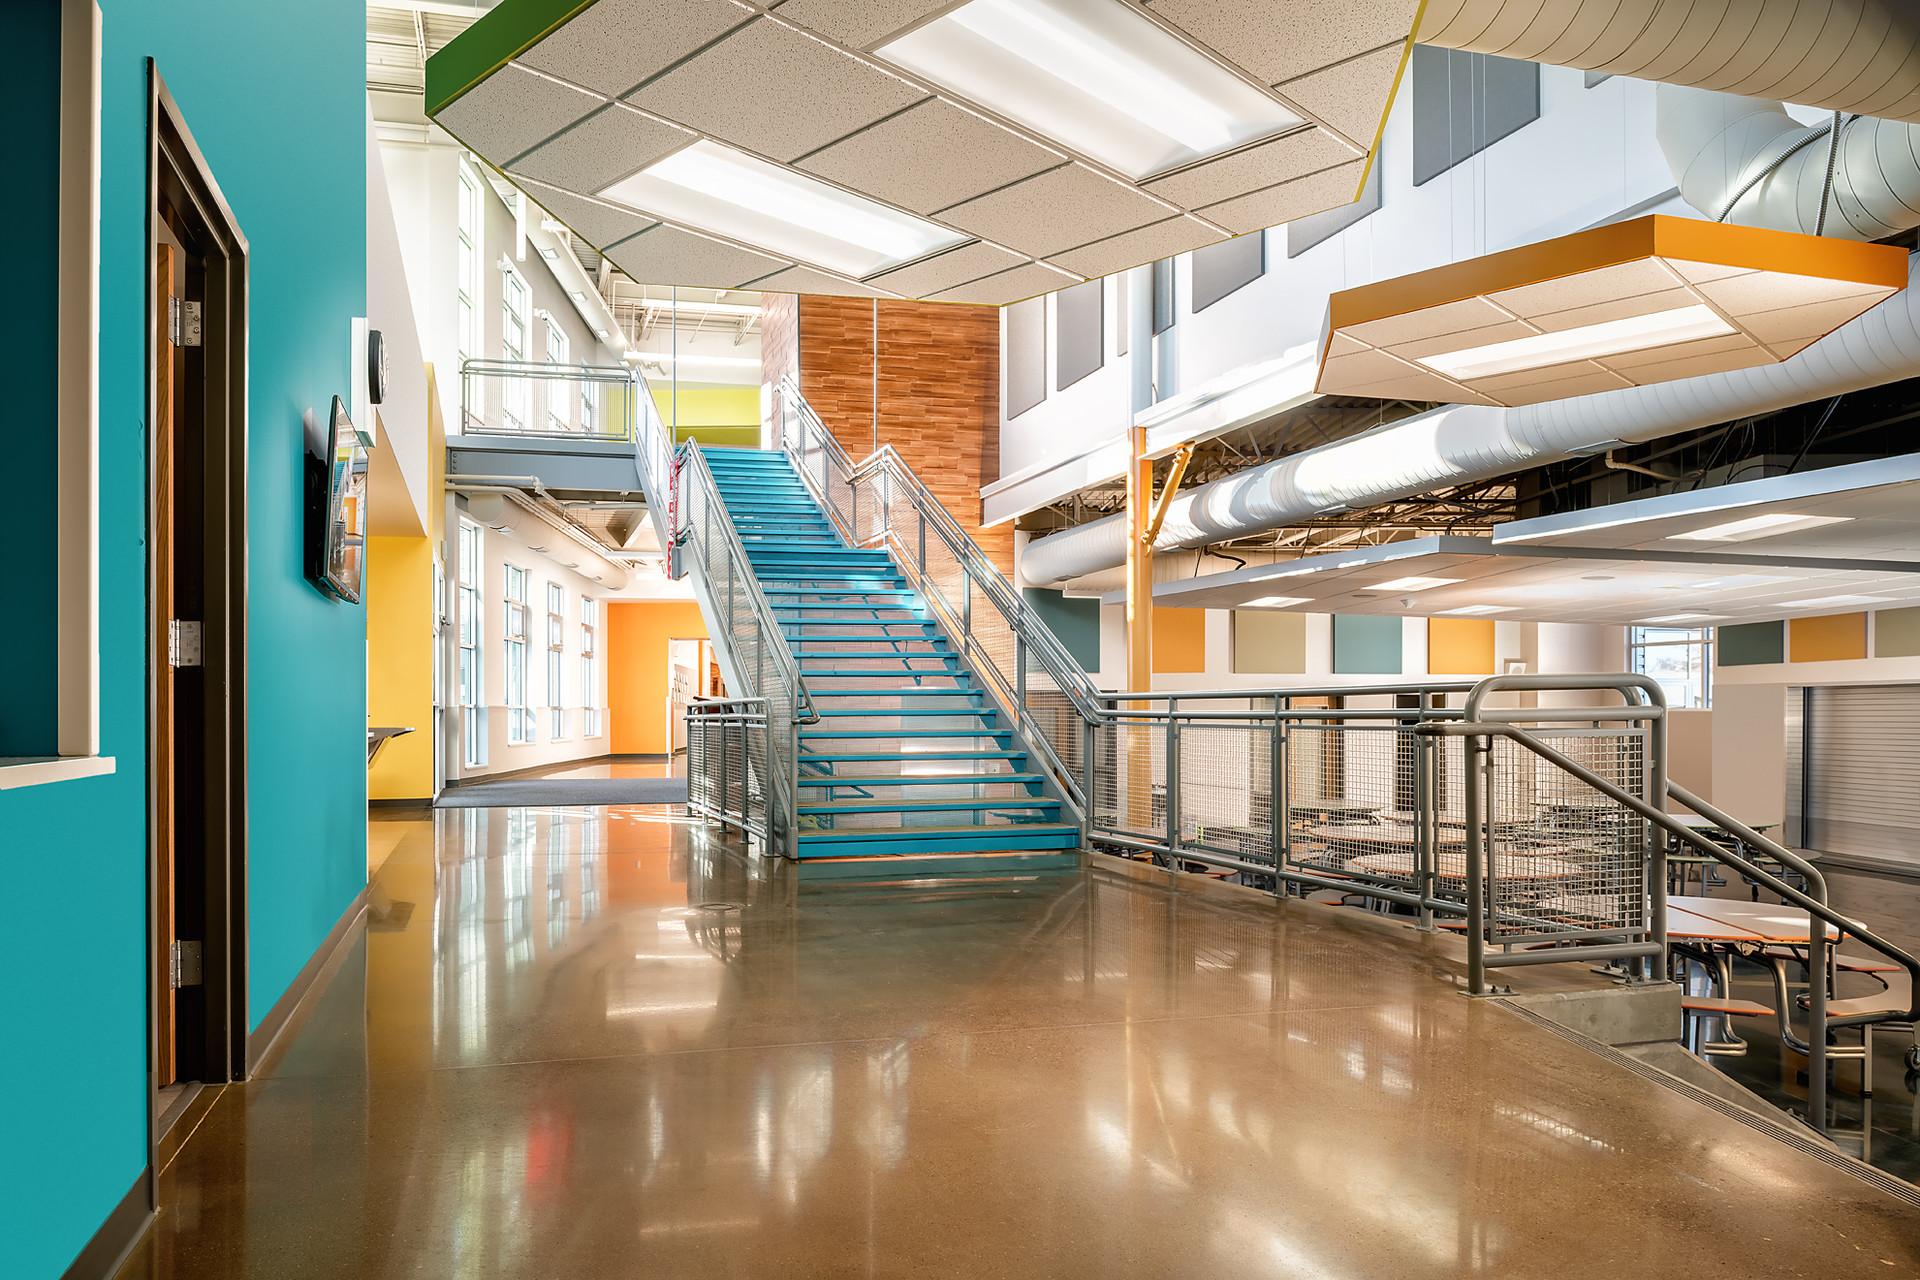 Giant Springs Elementary - Low Resolutio